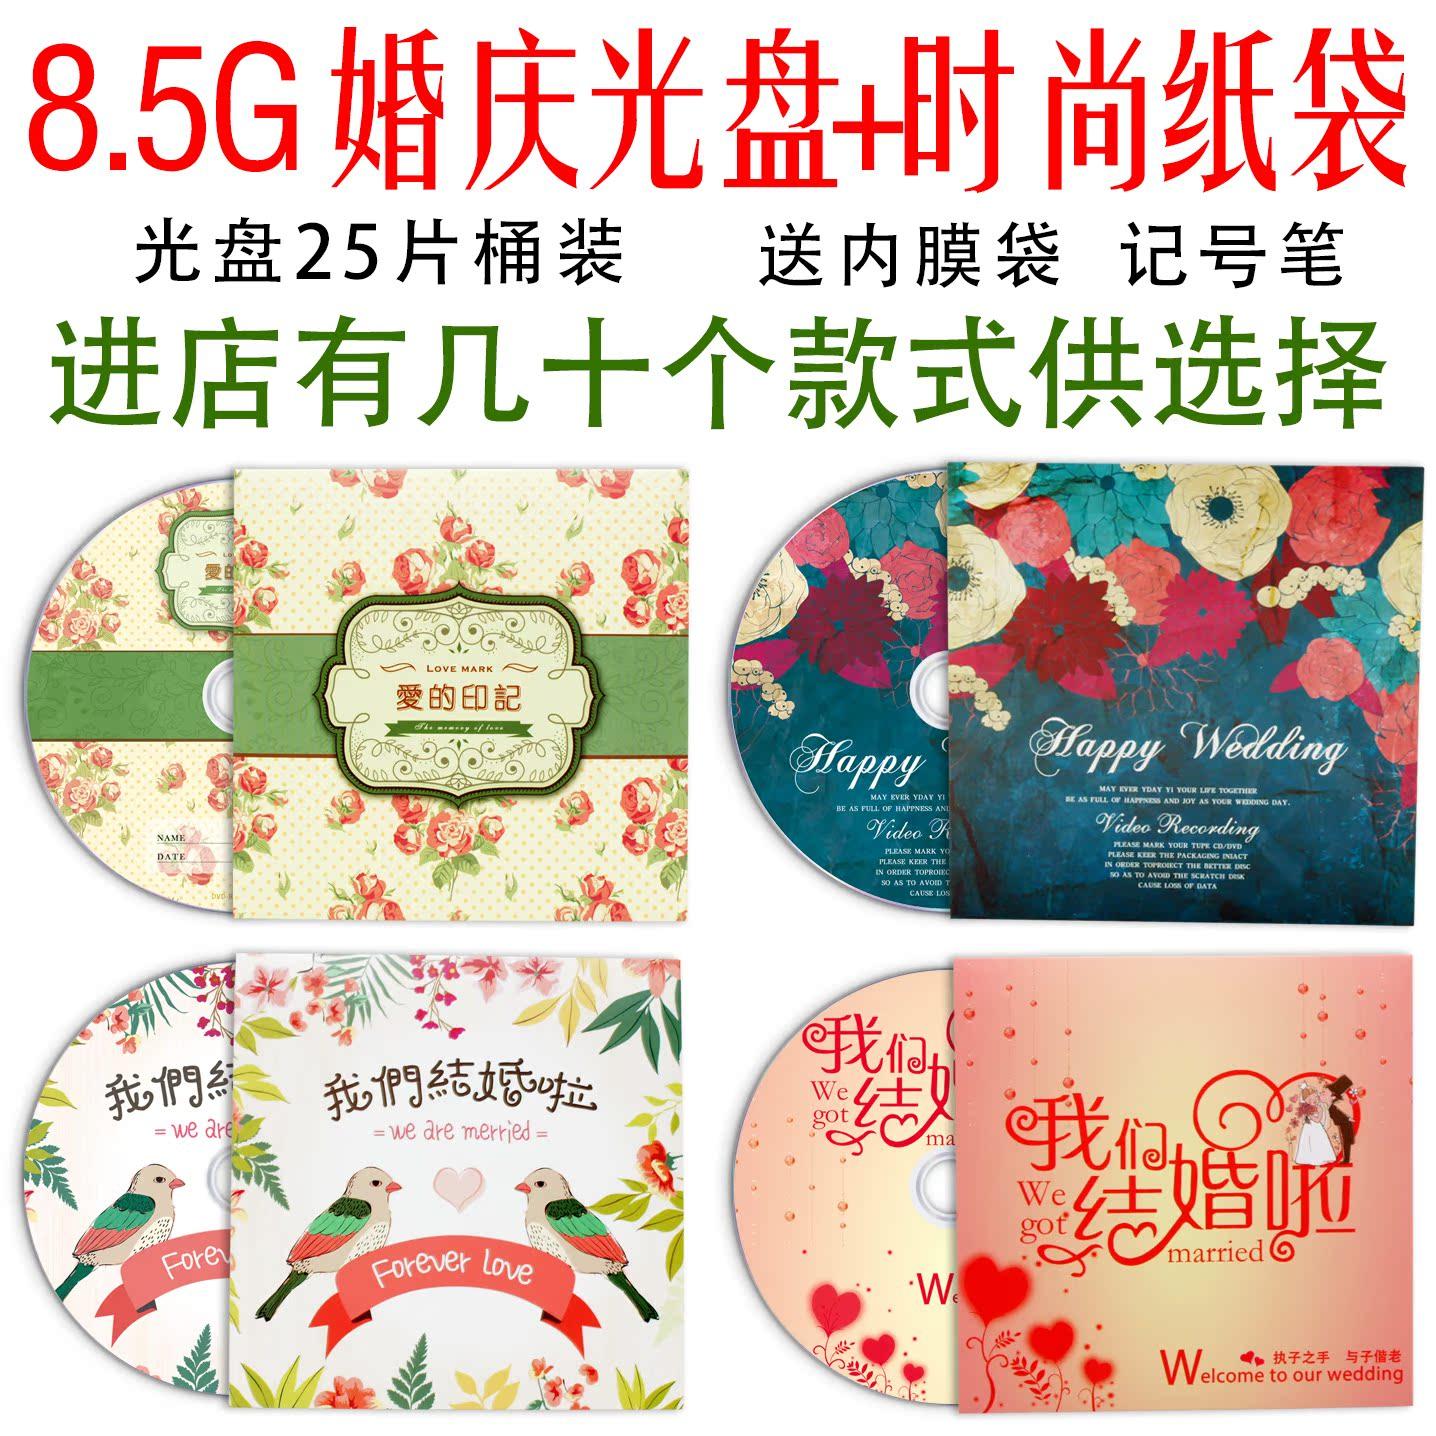 8.5G 婚庆刻录盘DVD+R DL 8X光盘结婚 婚礼8G光盘 25片 婚庆光盘